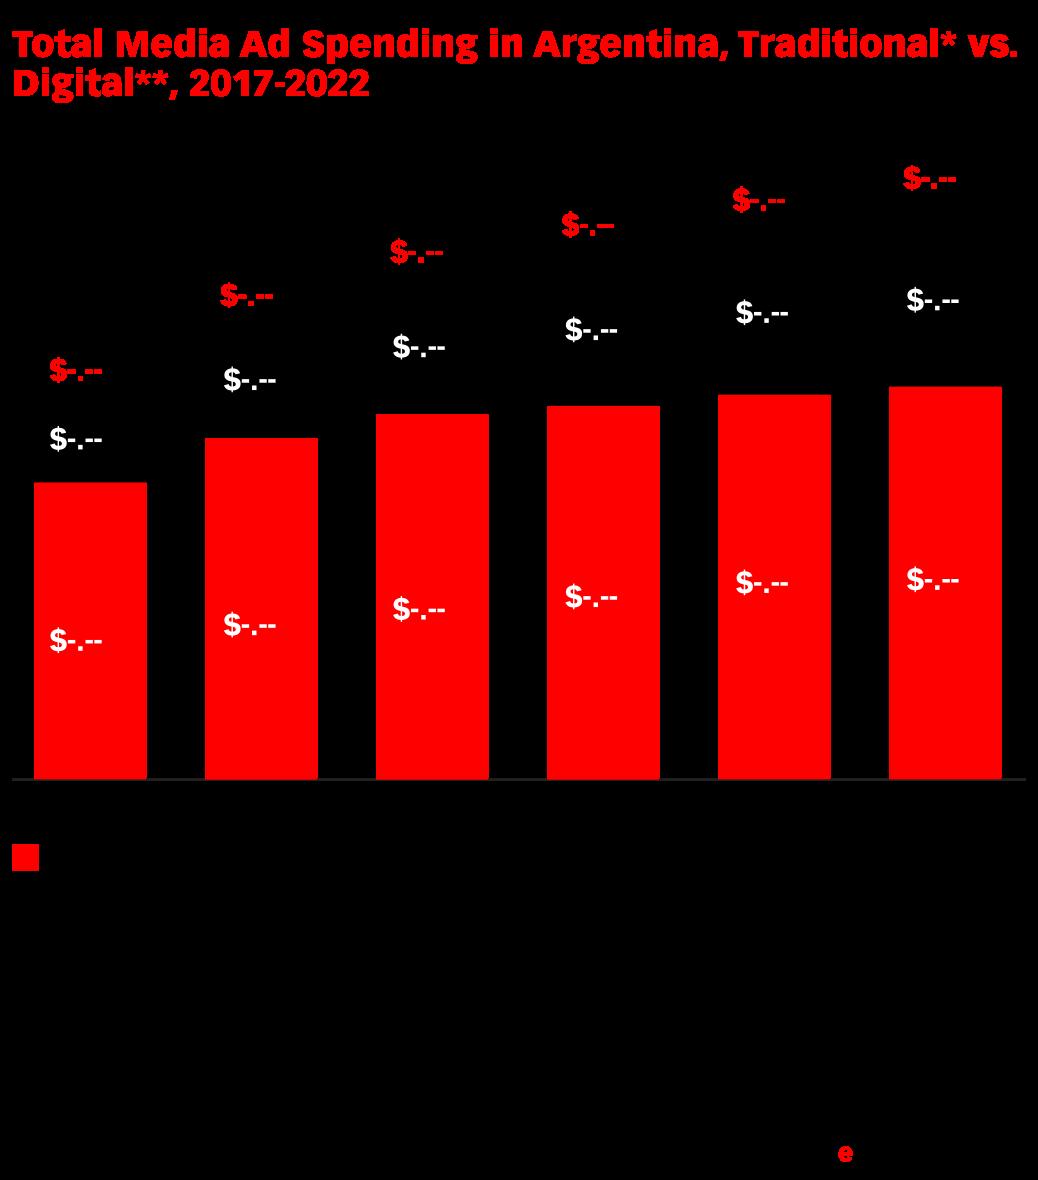 Total Media Ad Spending in Argentina, Traditional* vs. Digital**, 2017-2022 (billions)